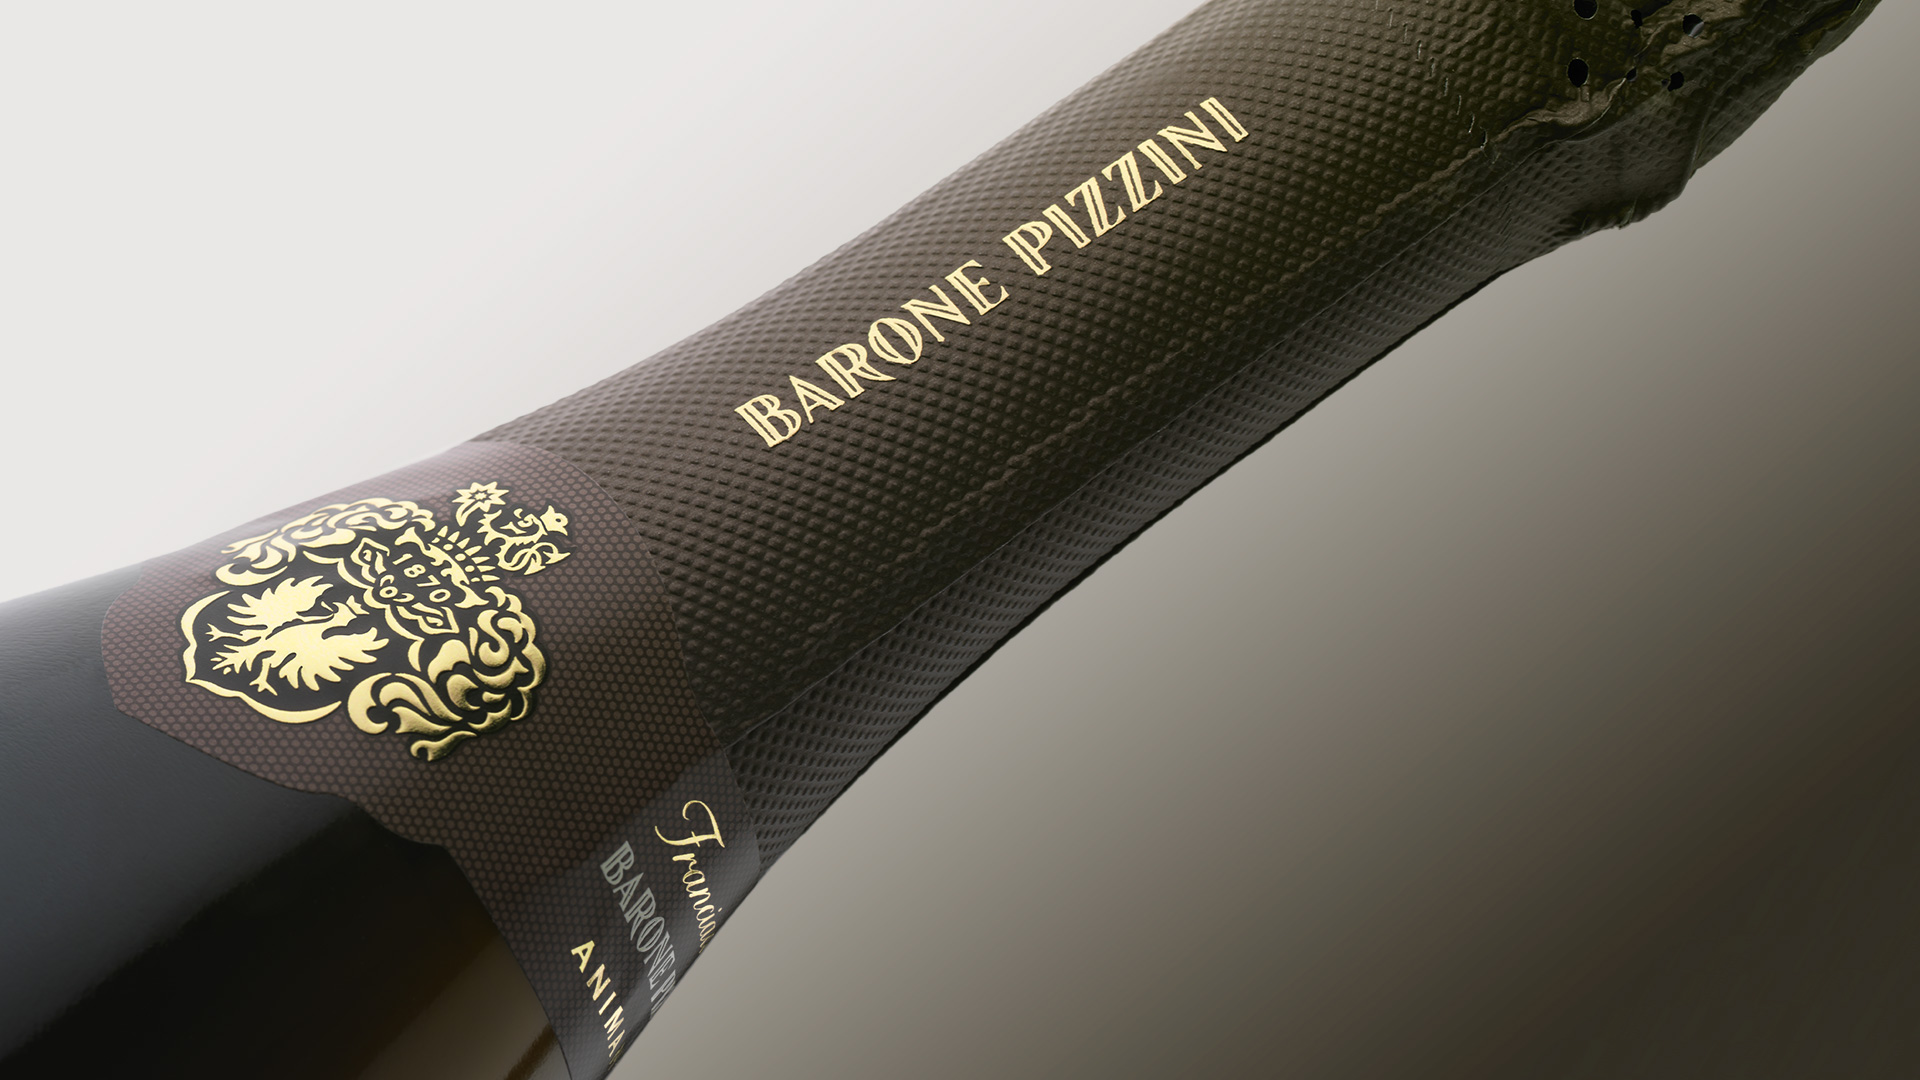 Barone Pizzini capsula branding